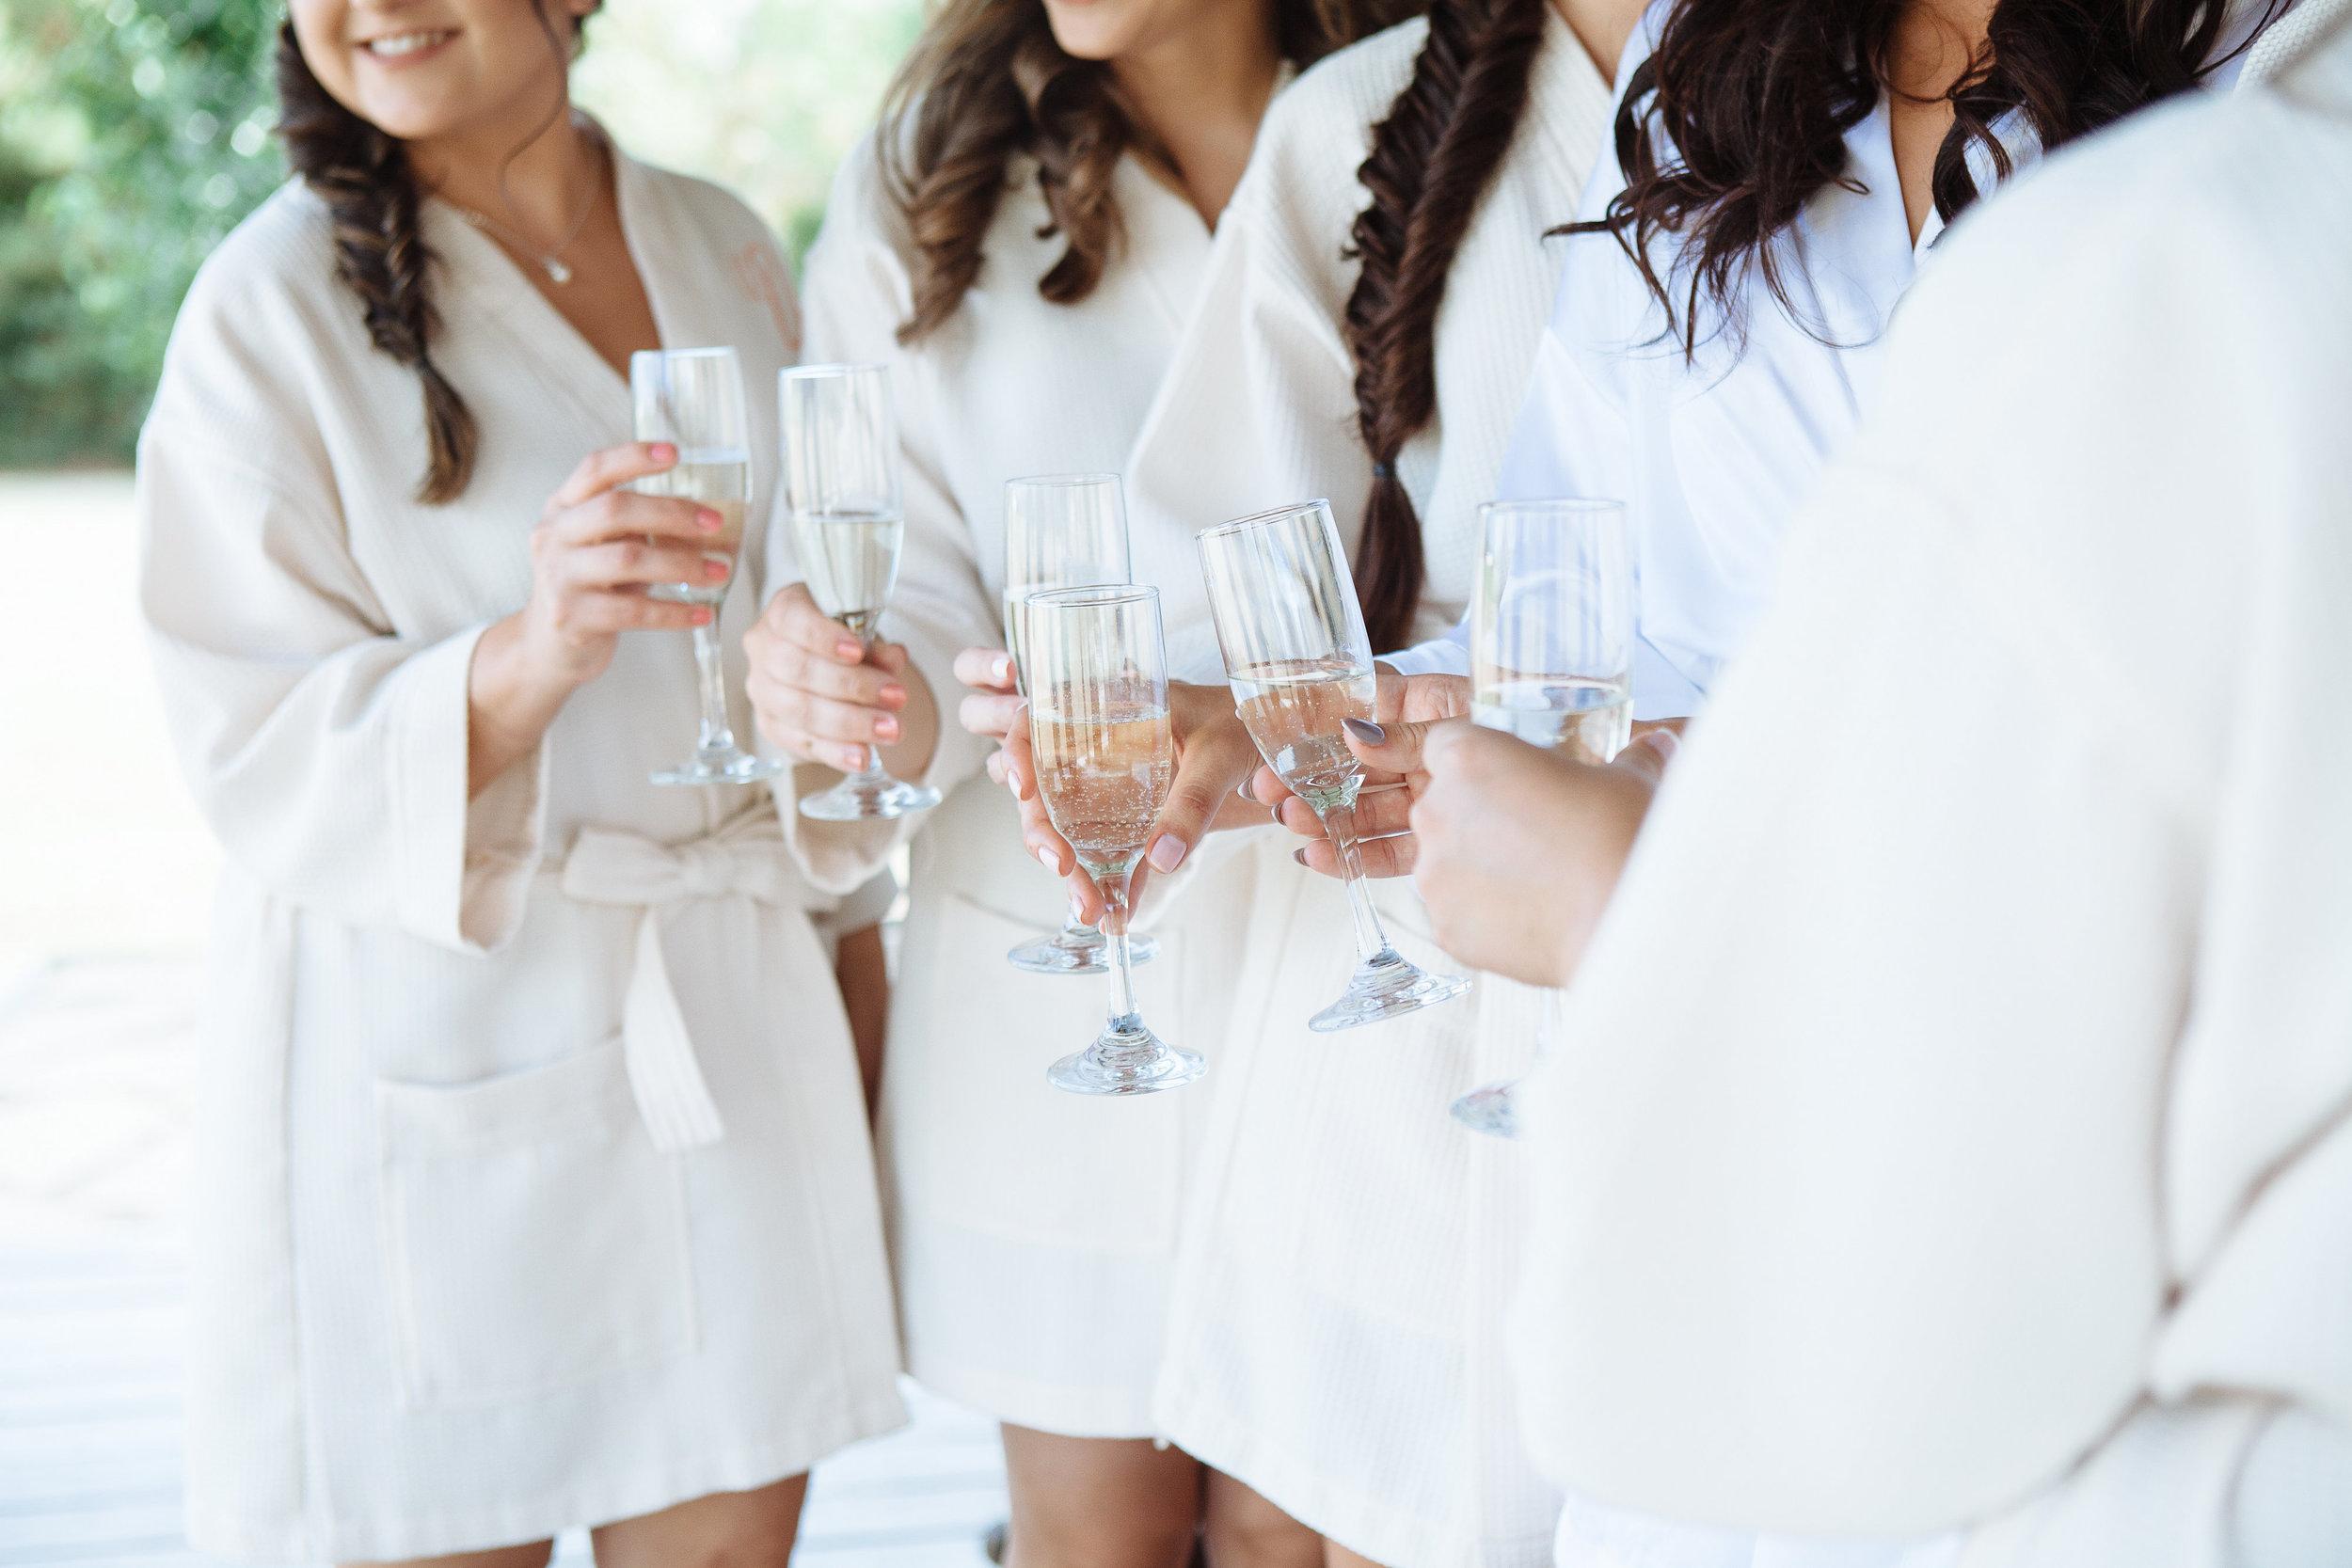 Plan Our Day Houston | Wedding Coordinators | Houston Tx, Wedding Planners | Ranch House Chapel Wedding